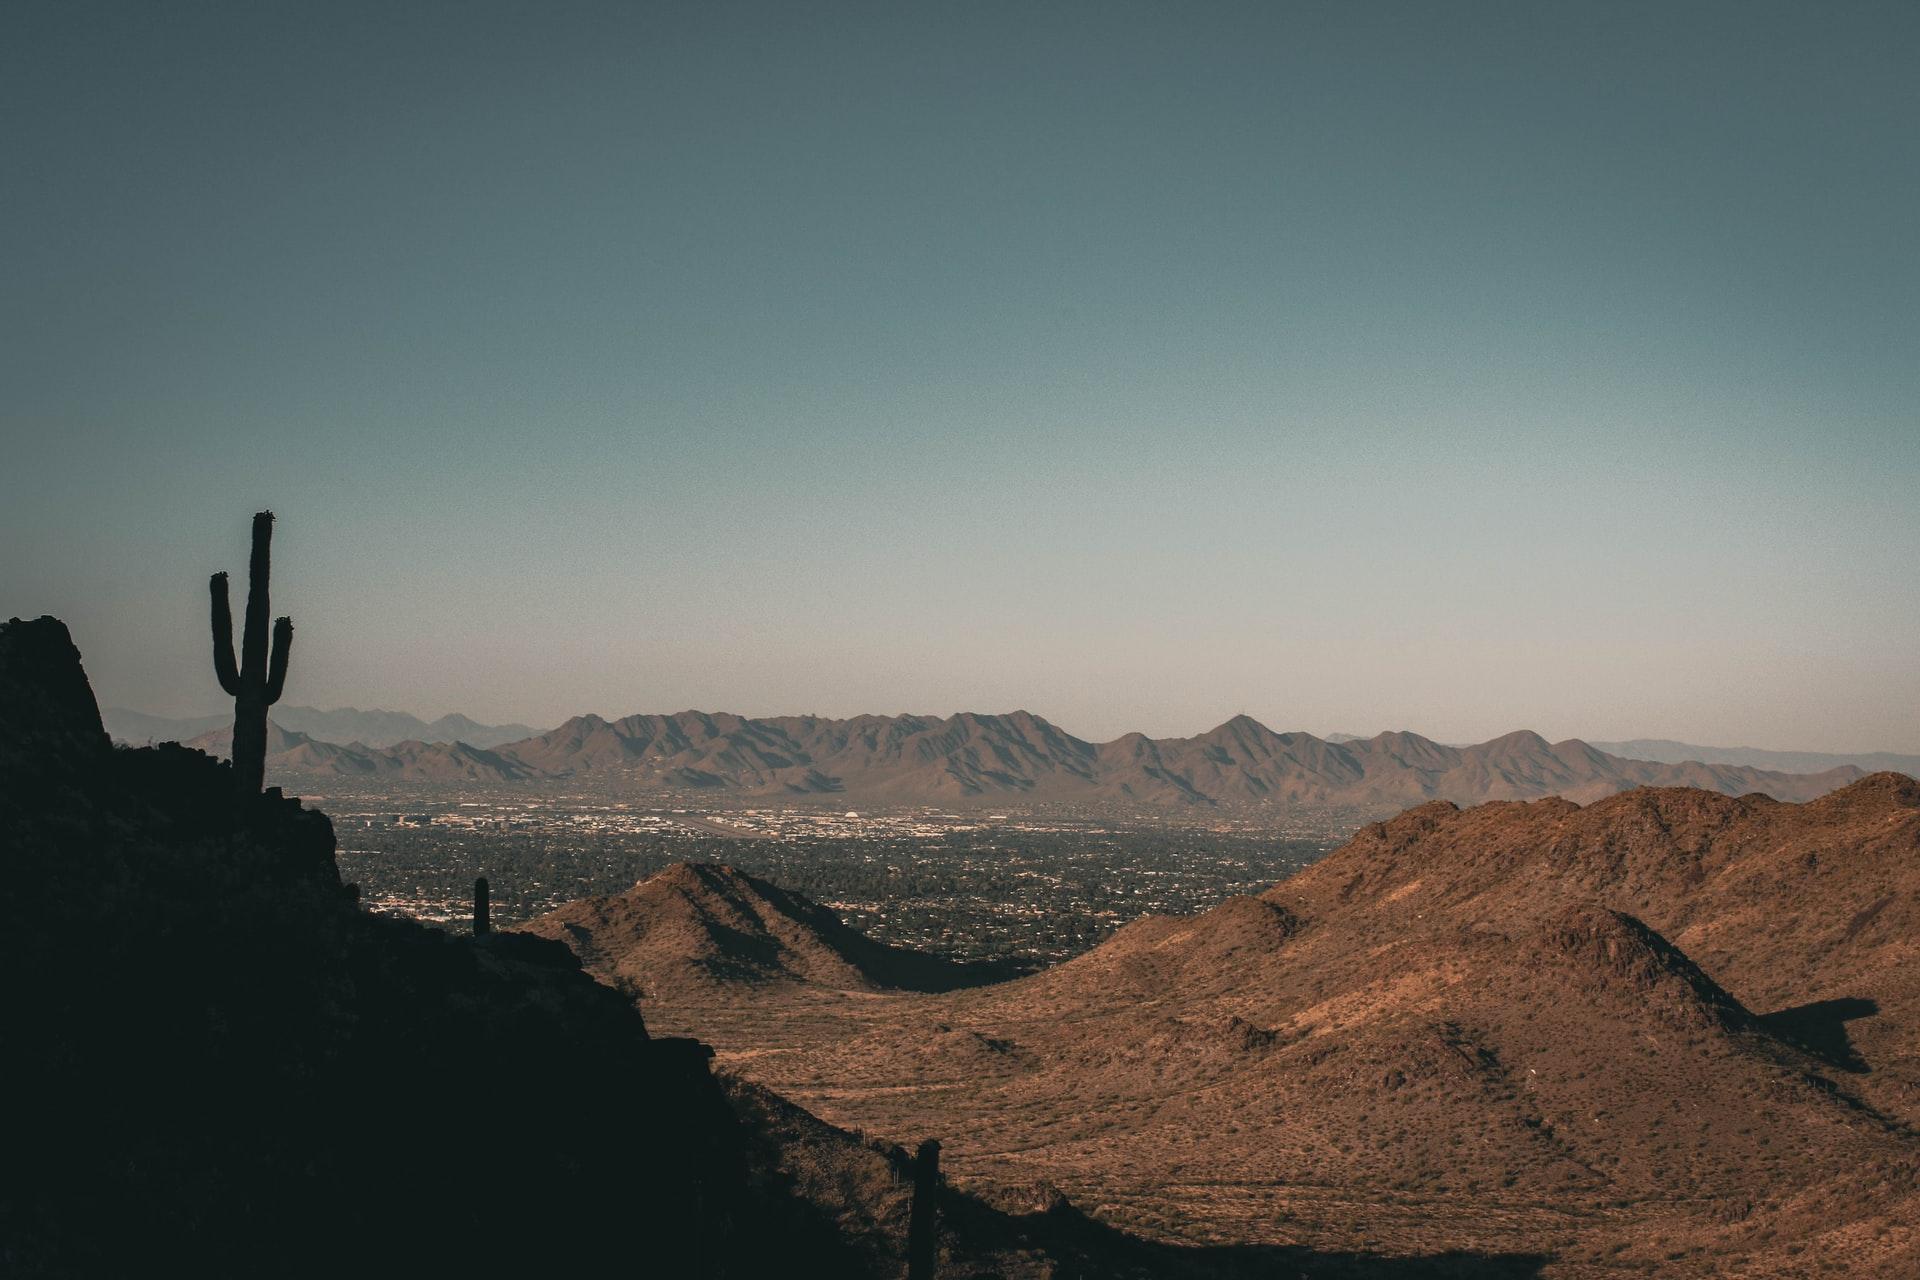 Desert and mountains in Phoenix, Arizona.